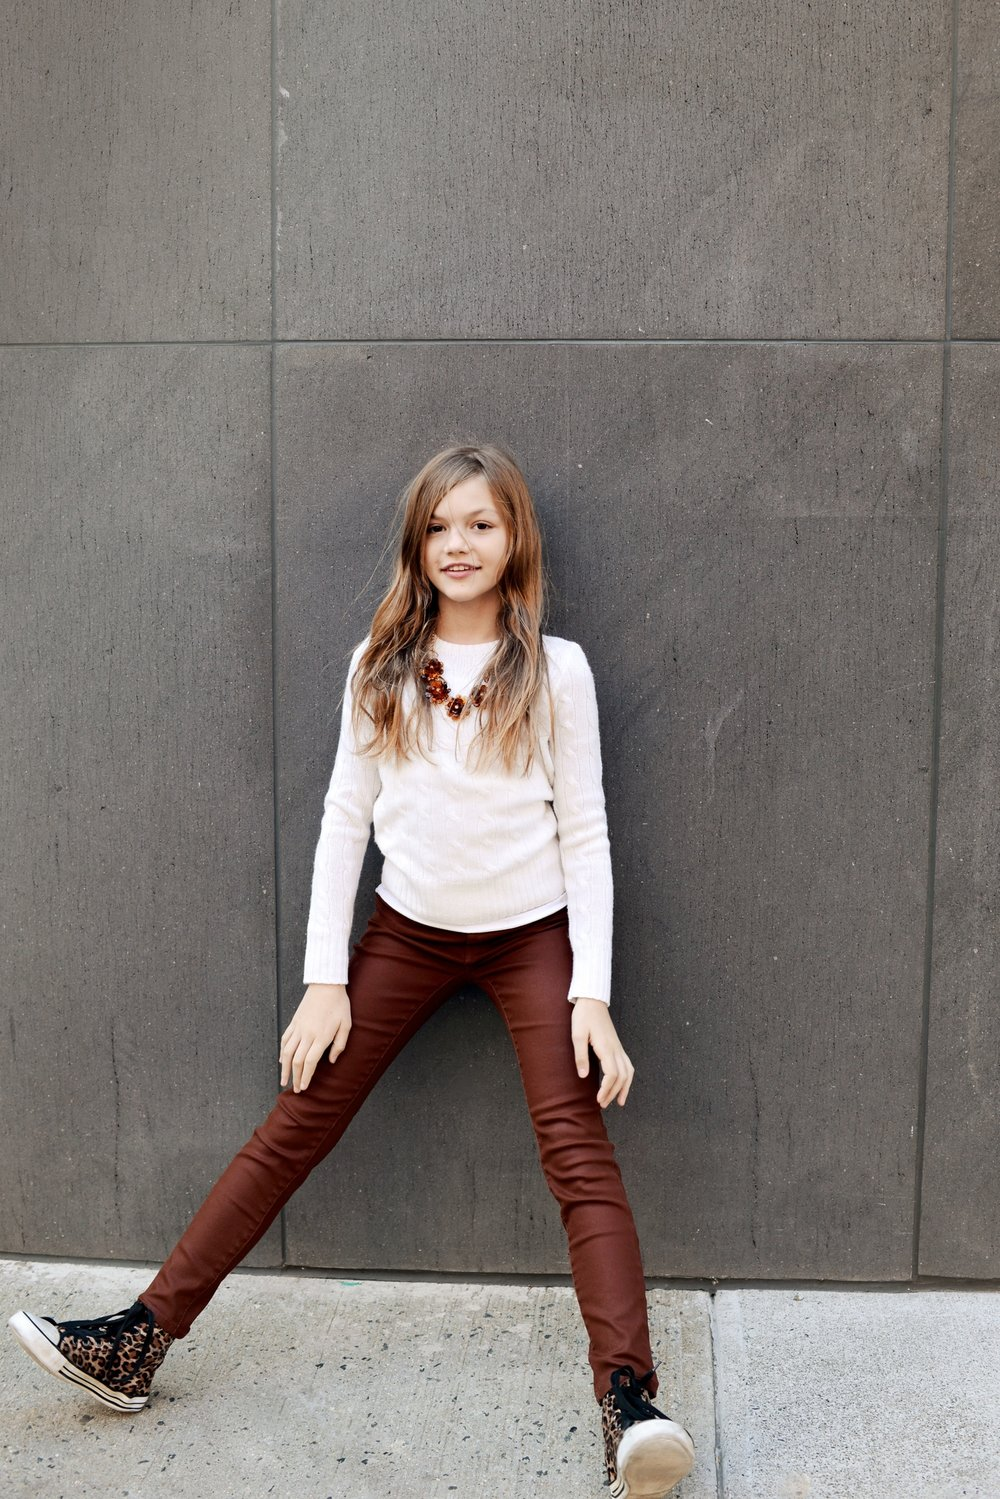 Enfant+Street+Style+by+Gina+Kim+Photography-44.jpeg